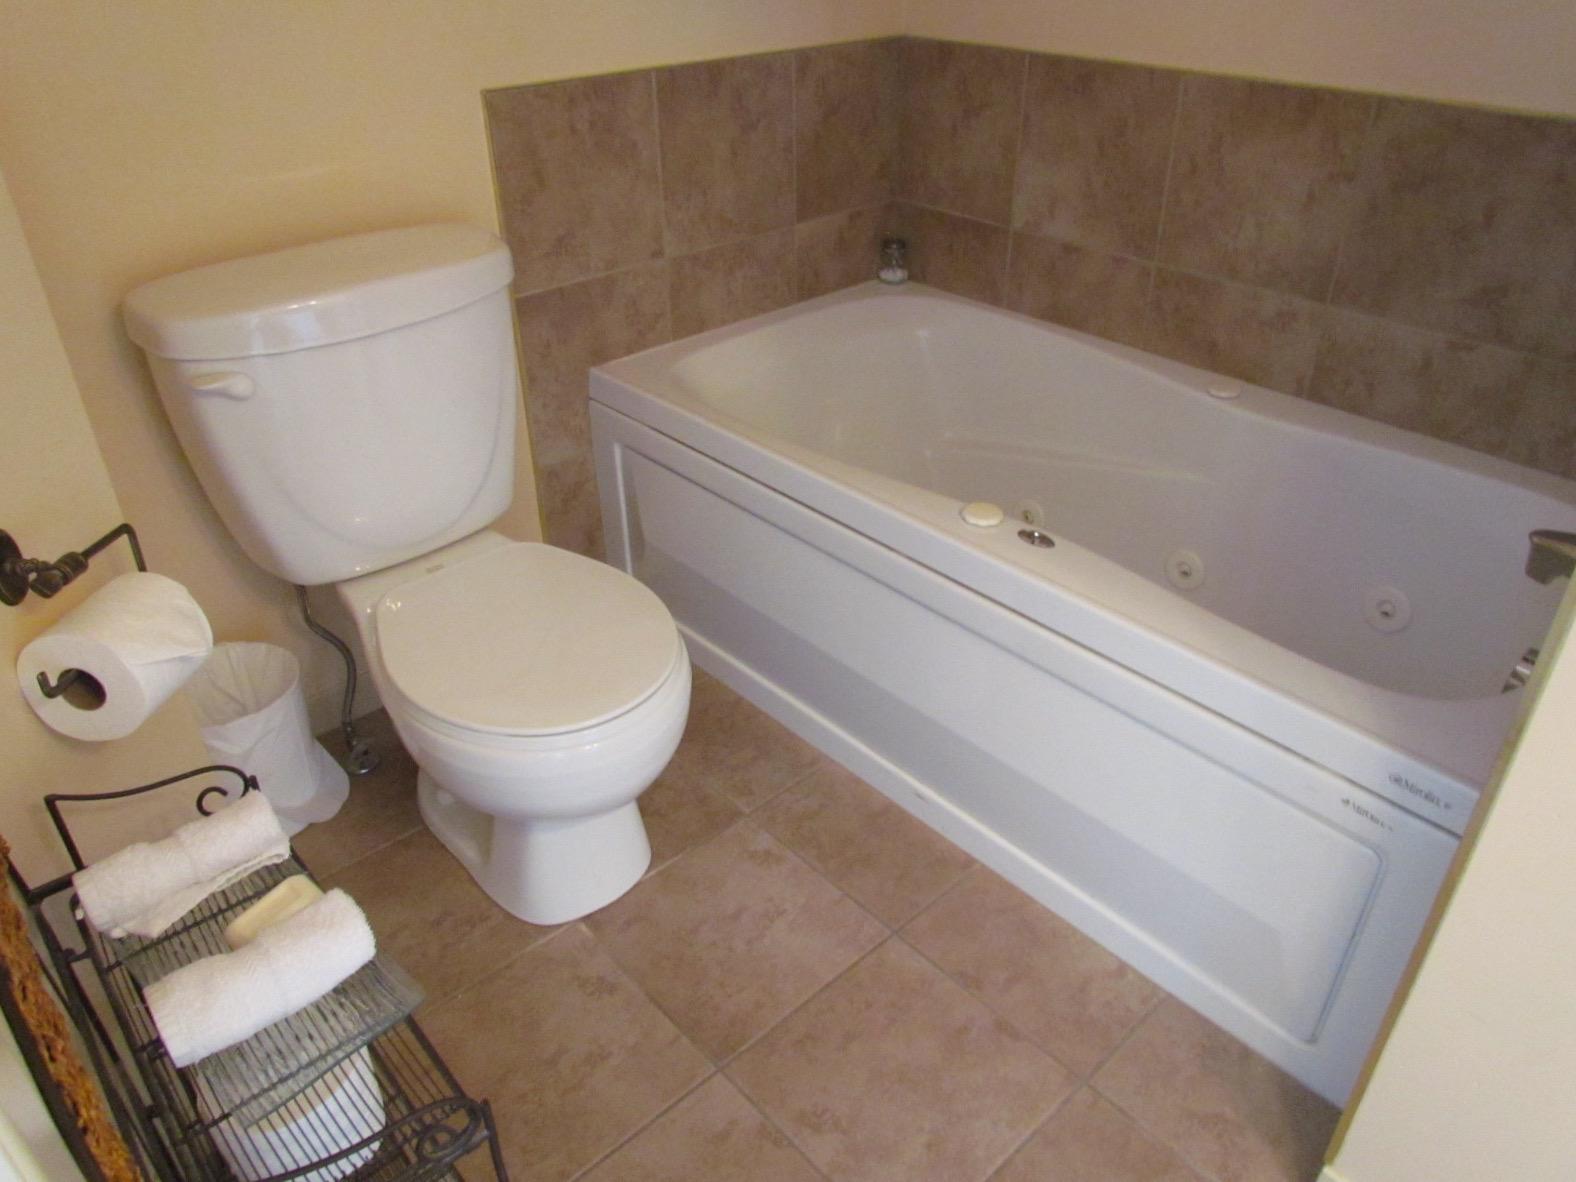 toilet bathroom bnb b&b jacuzzi relaxing calm peaceful